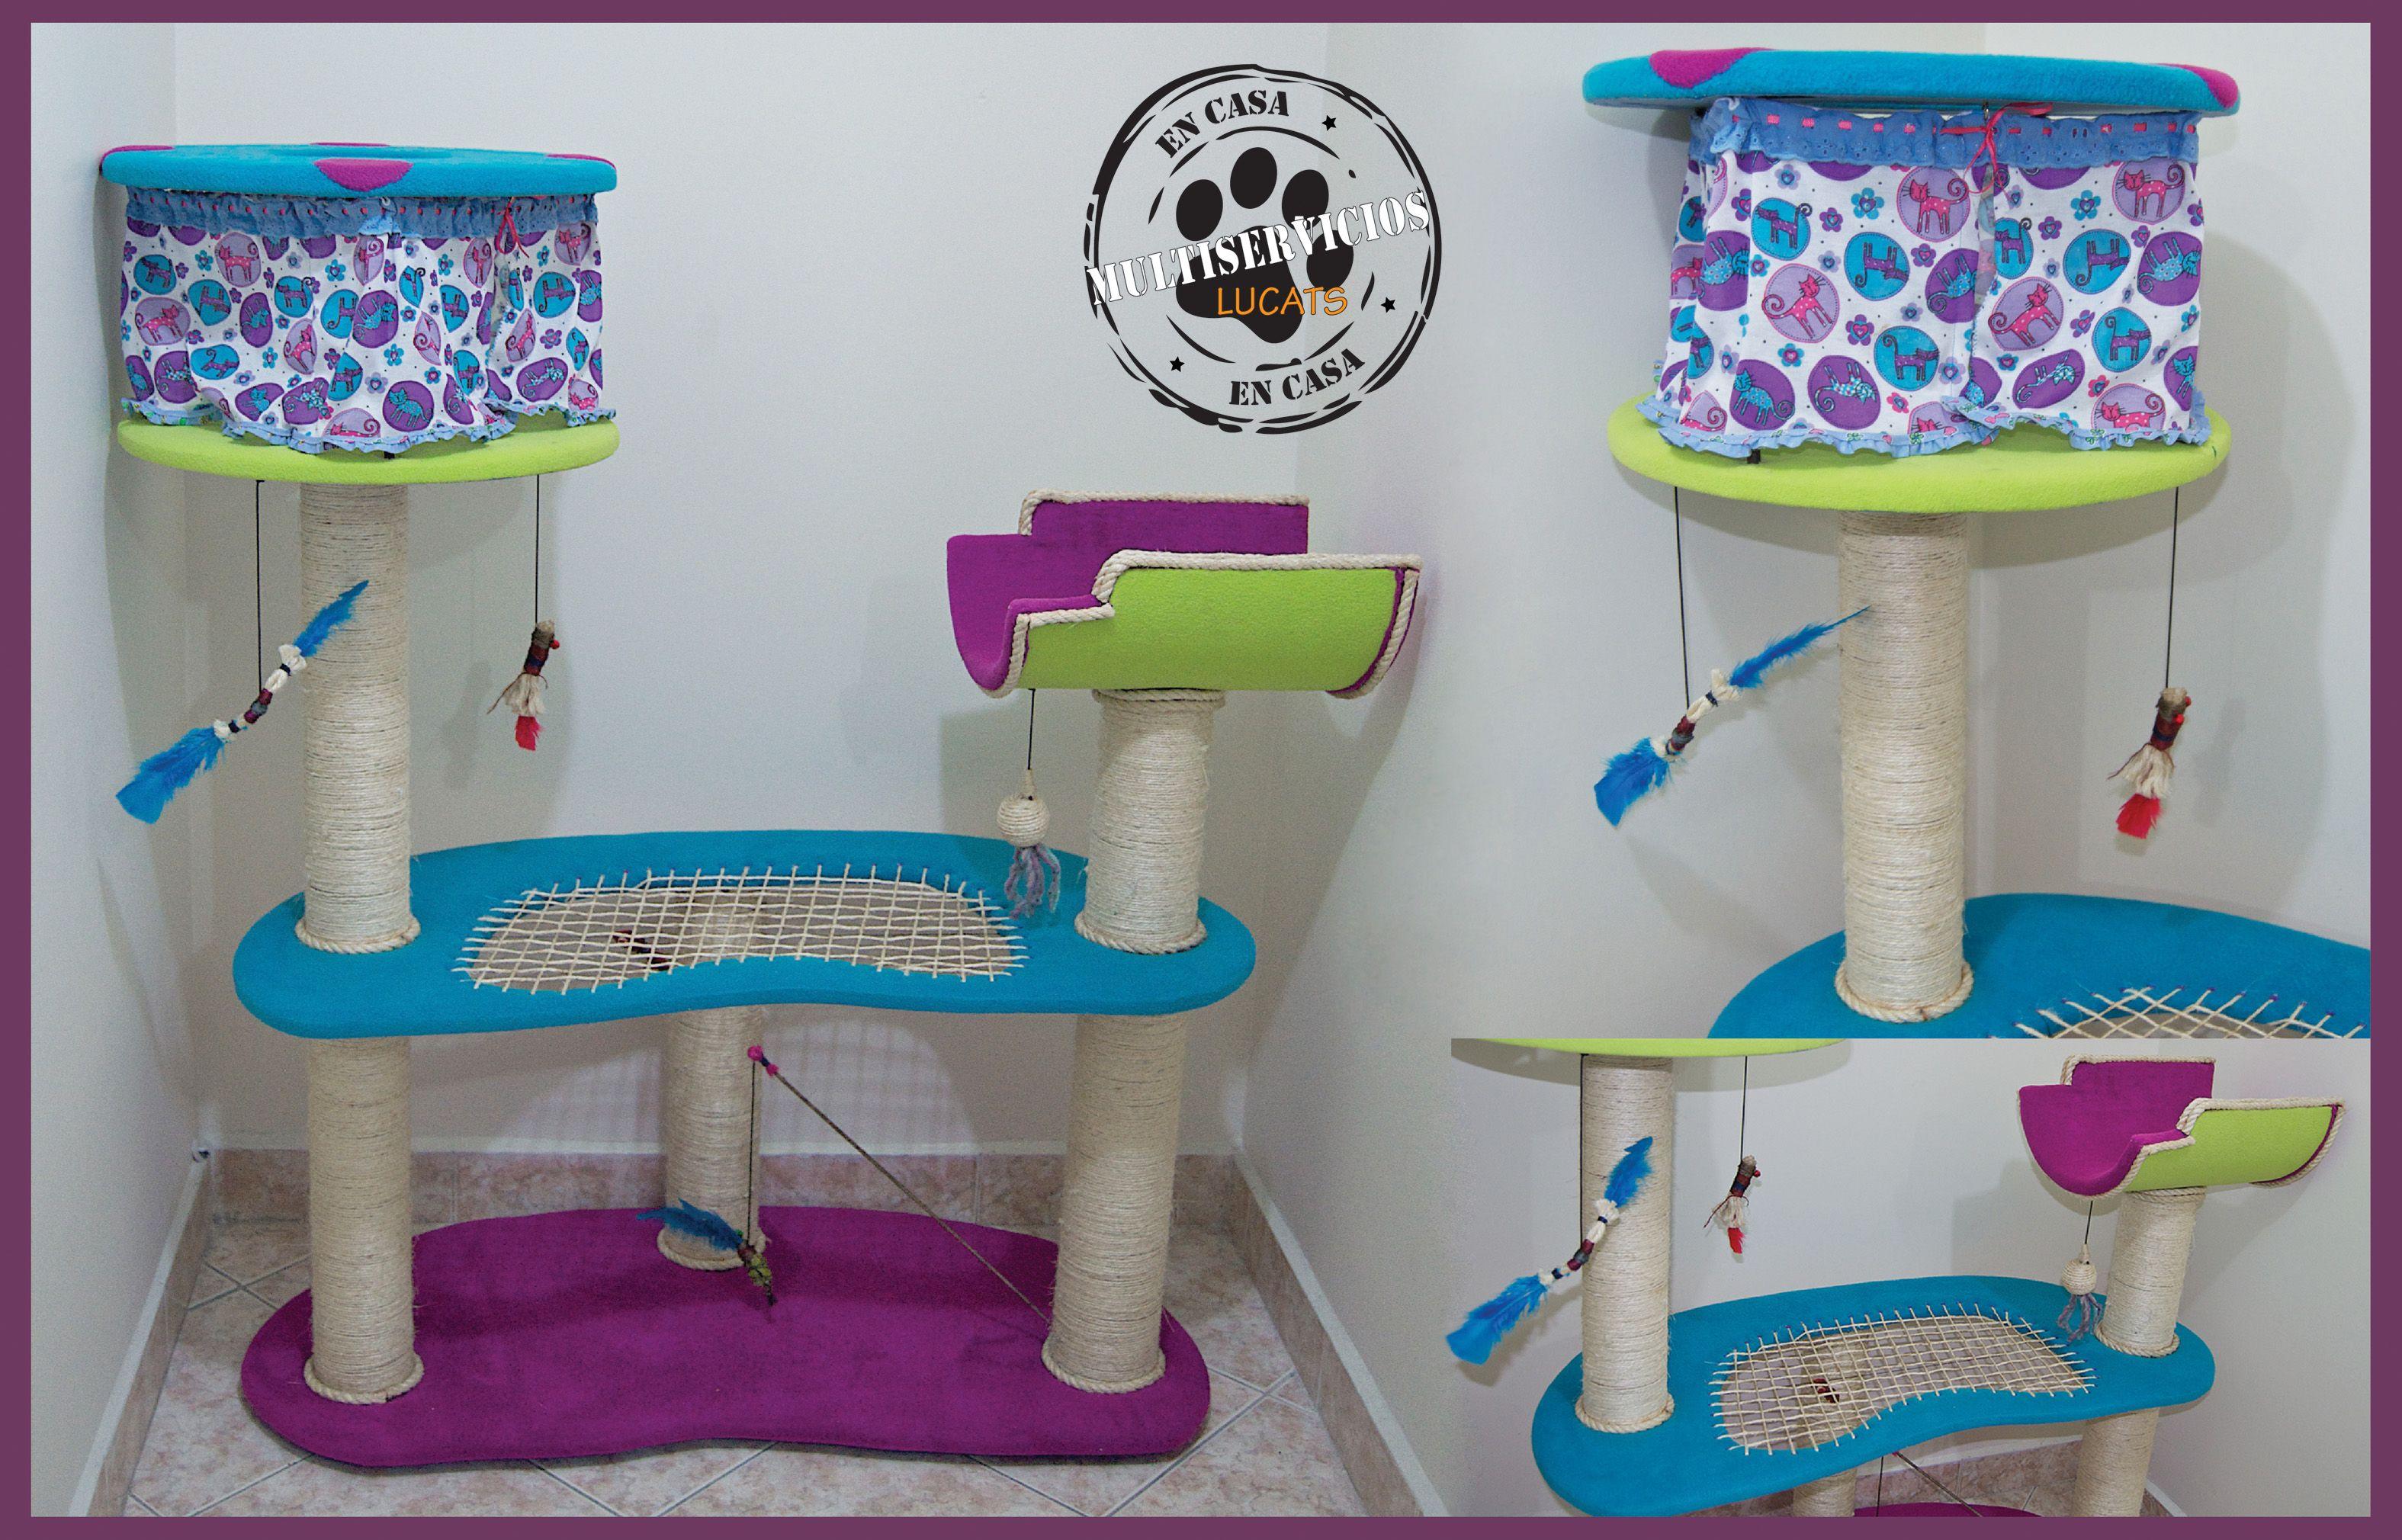 Gimnasio para gatos Lucas Arango Mascotas